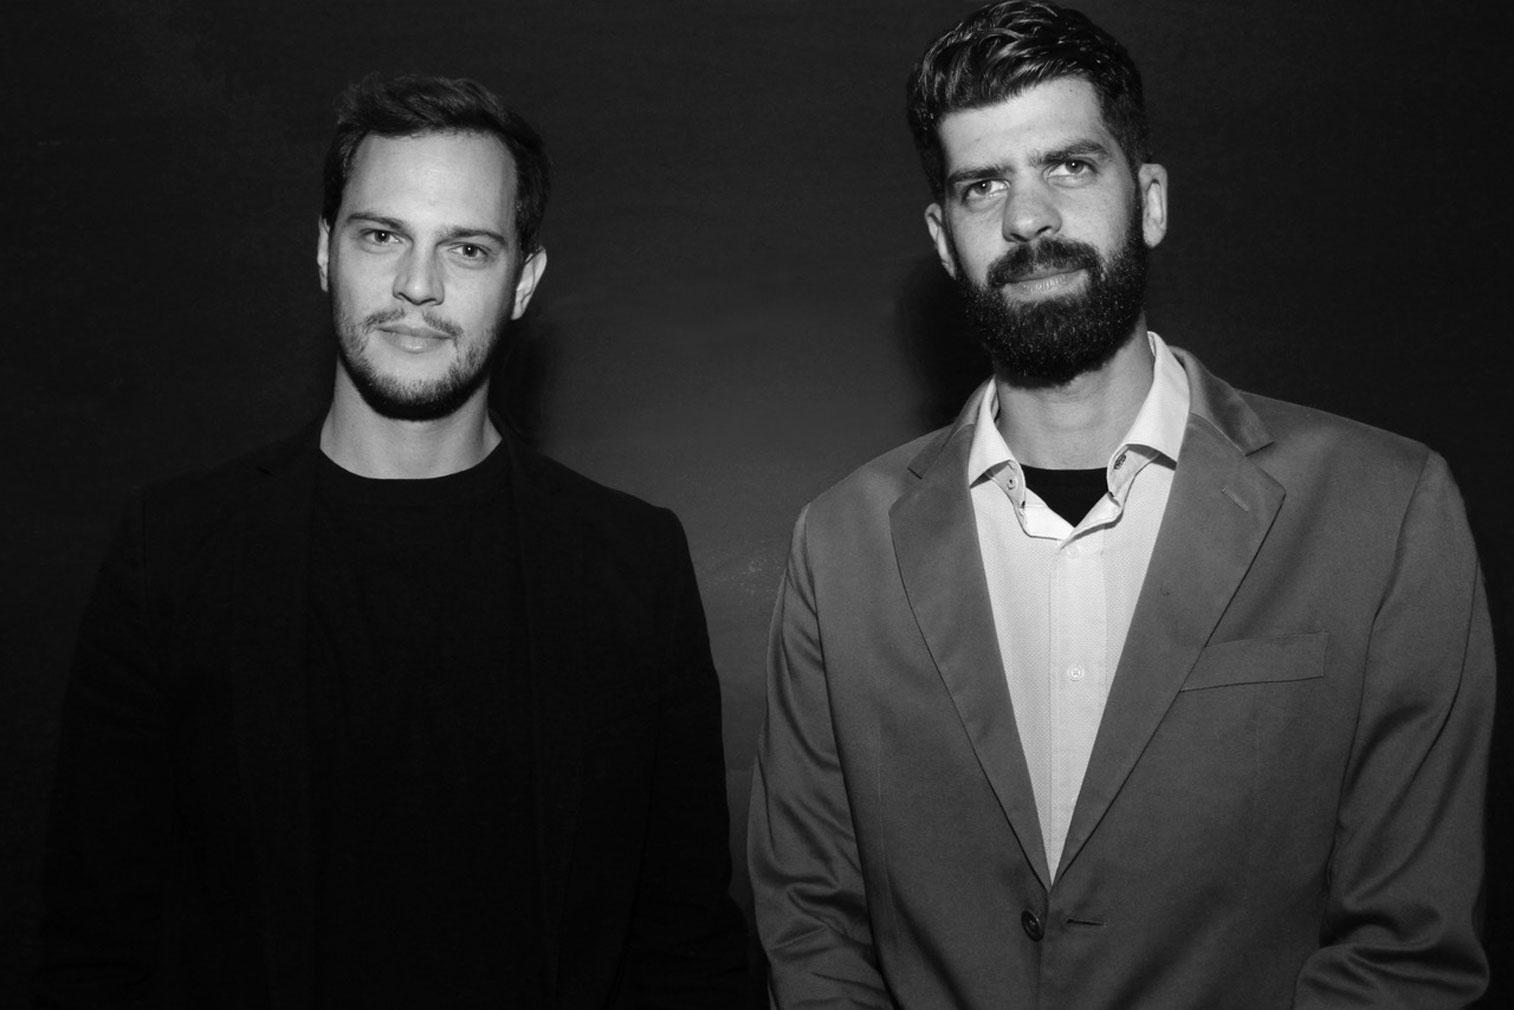 Gustavo Utrabo and Pedro Duschenes of Aleph Zero - winner of the RIBA Emerging Architect Award 2018